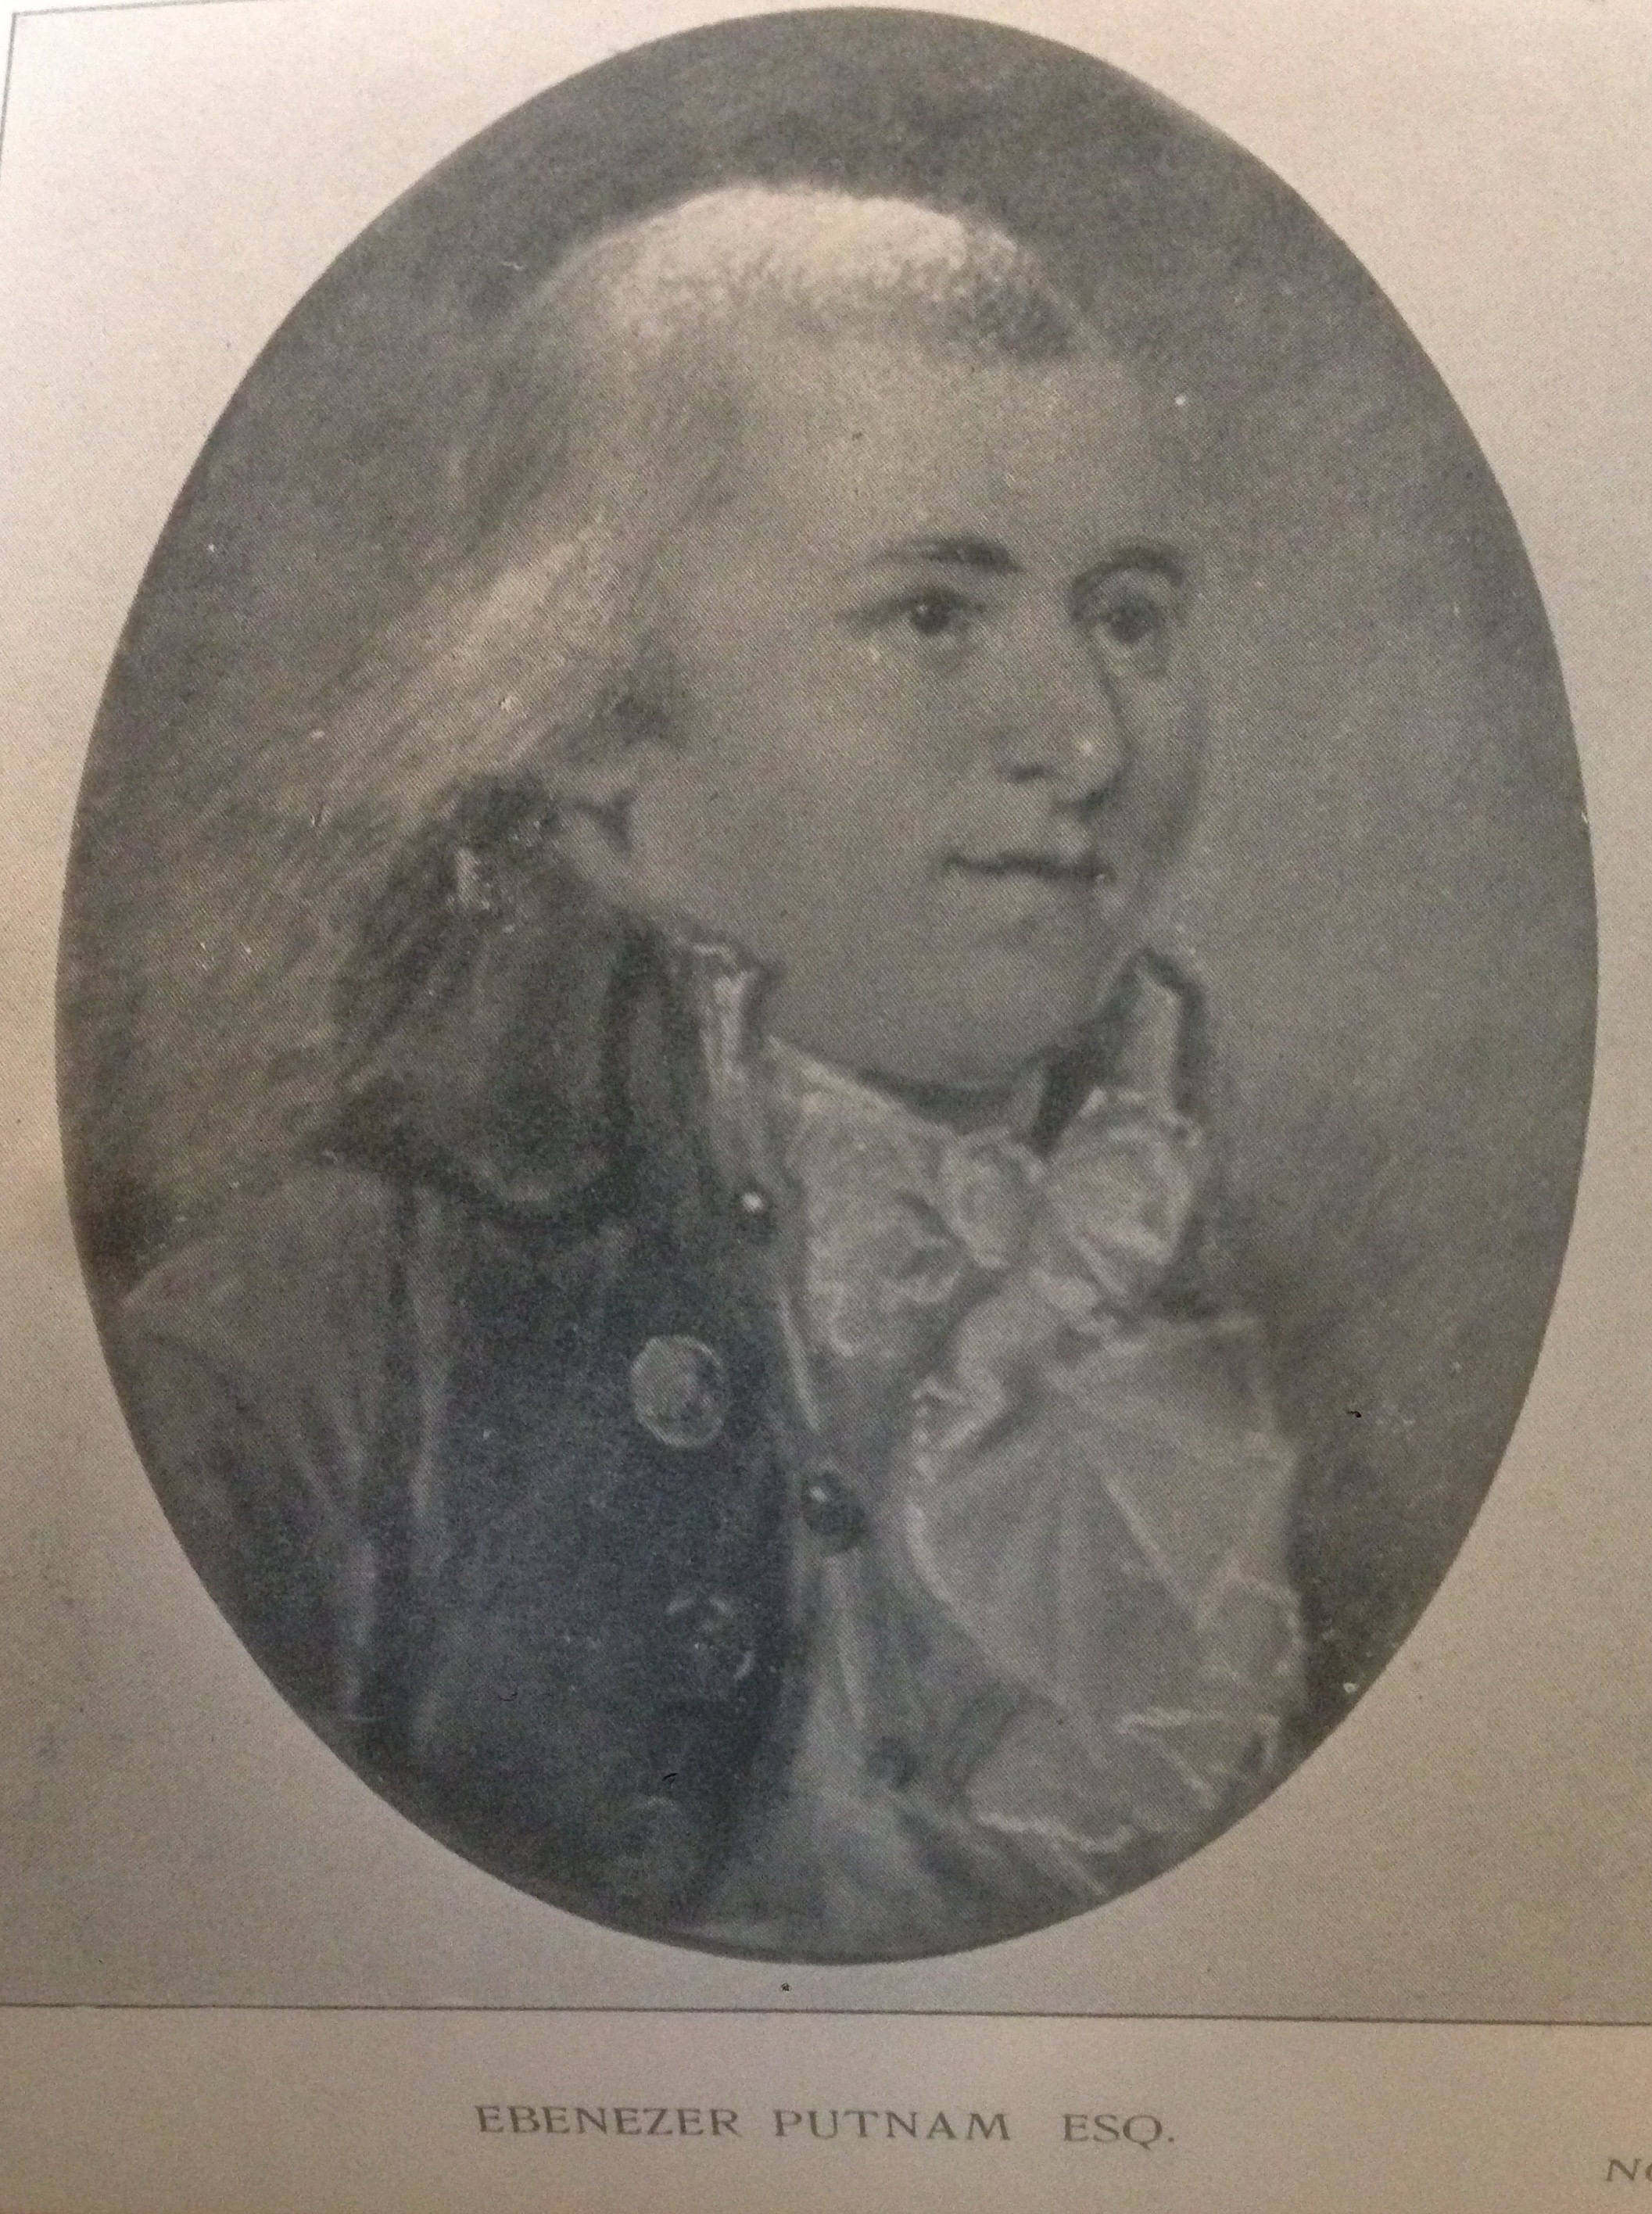 Ebenezer Putnam